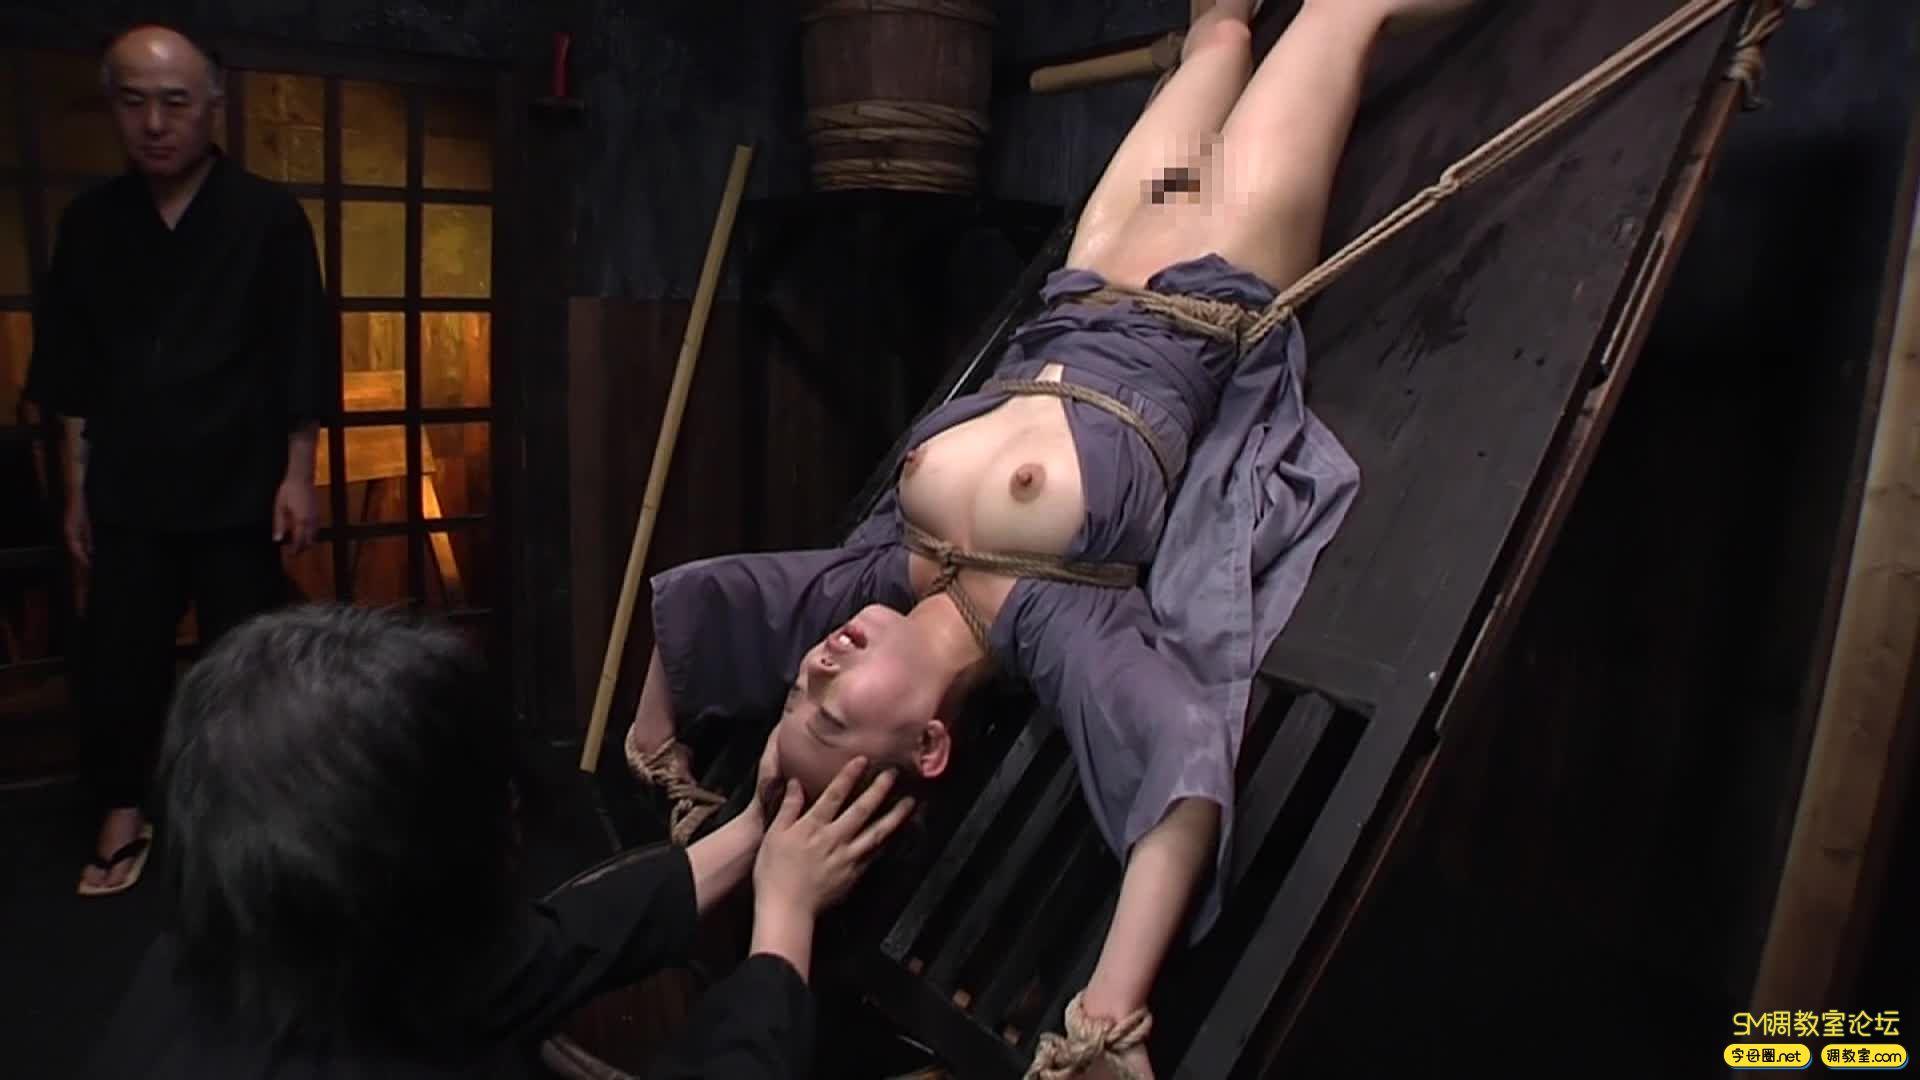 [Dogma合集] - GTJ-030 - 縄・女囚拷問 美咲結衣-视频截图7